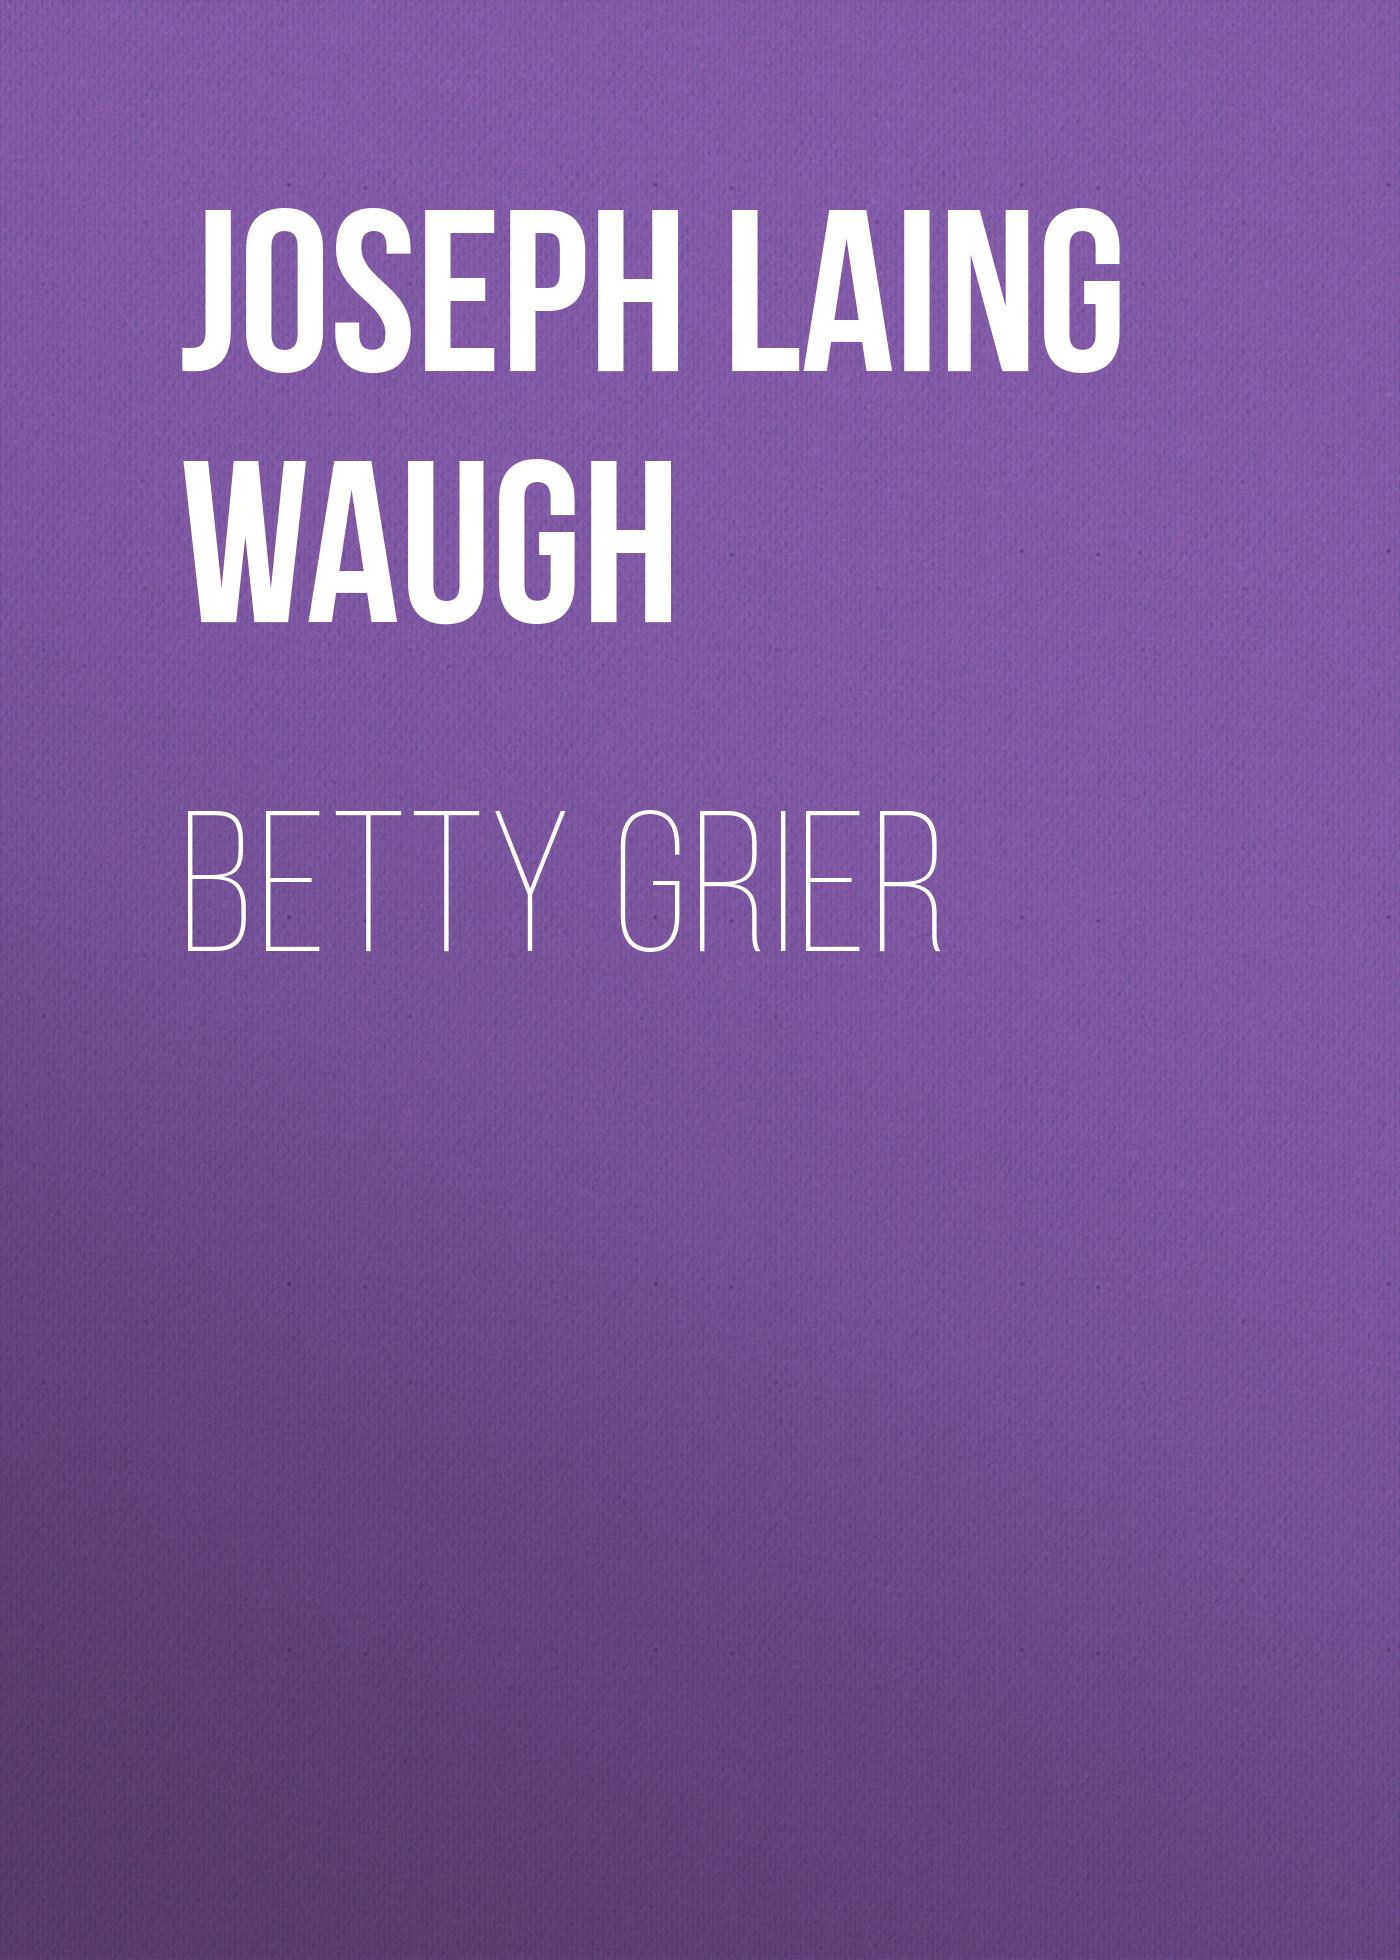 Joseph Laing Waugh Betty Grier сумка betty boop a3268 19 2015